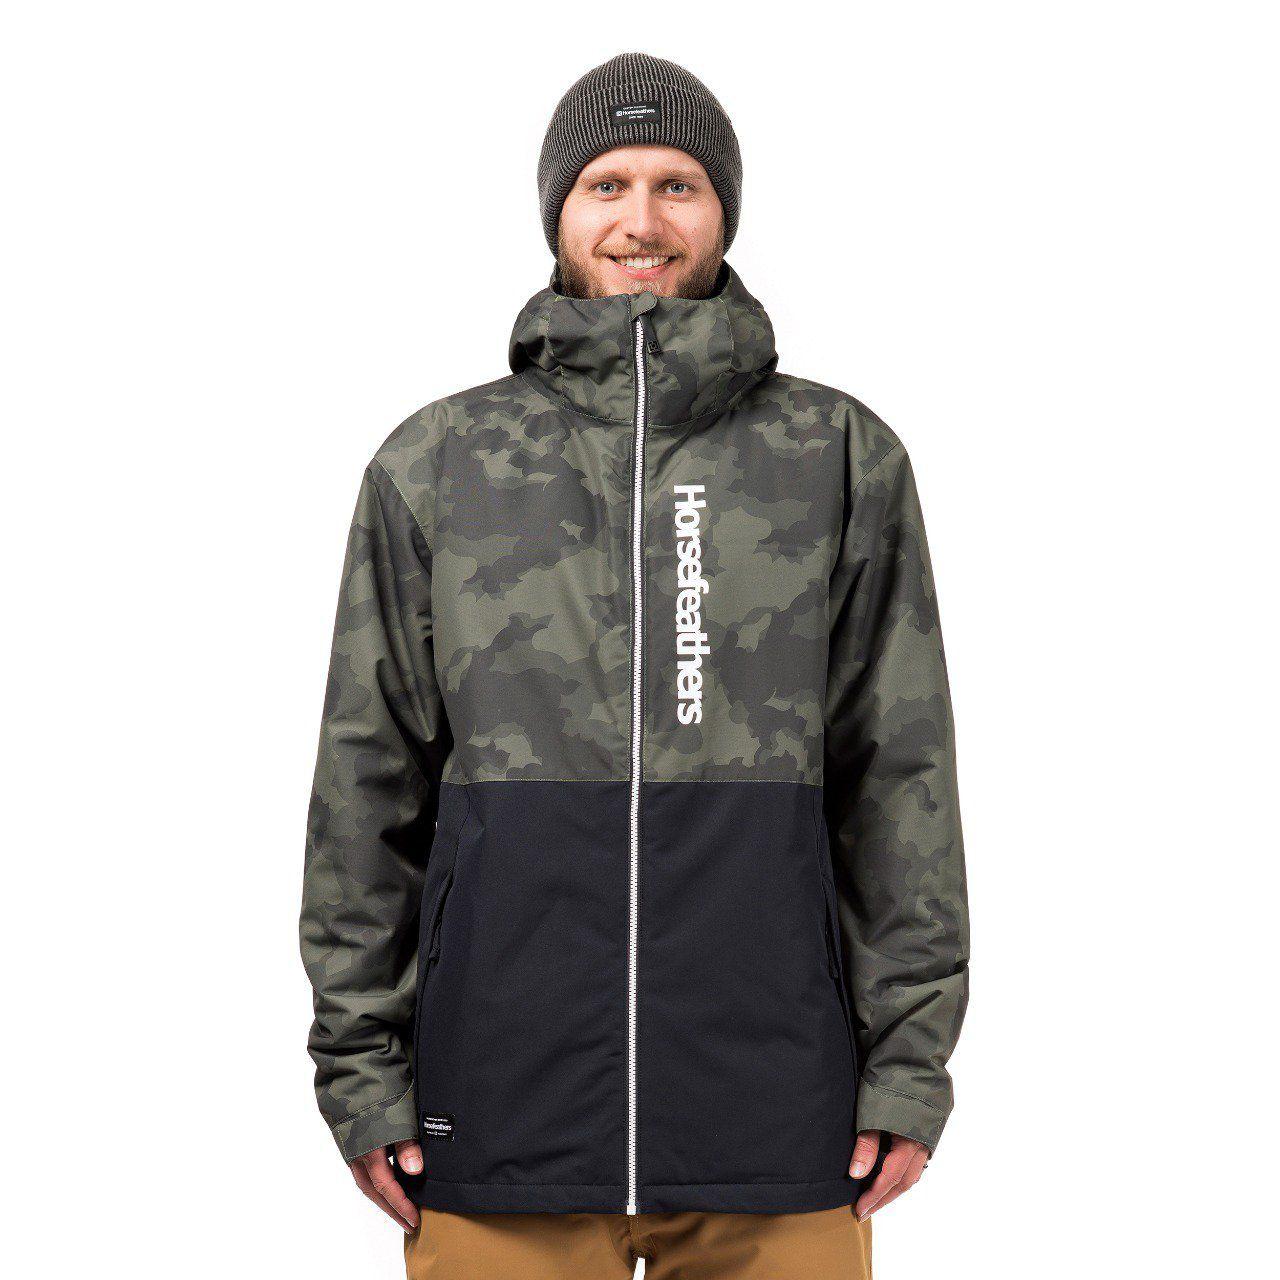 Horsefeathers Snowboard Et De Ski Dagger Veste wxWIzCq8tn